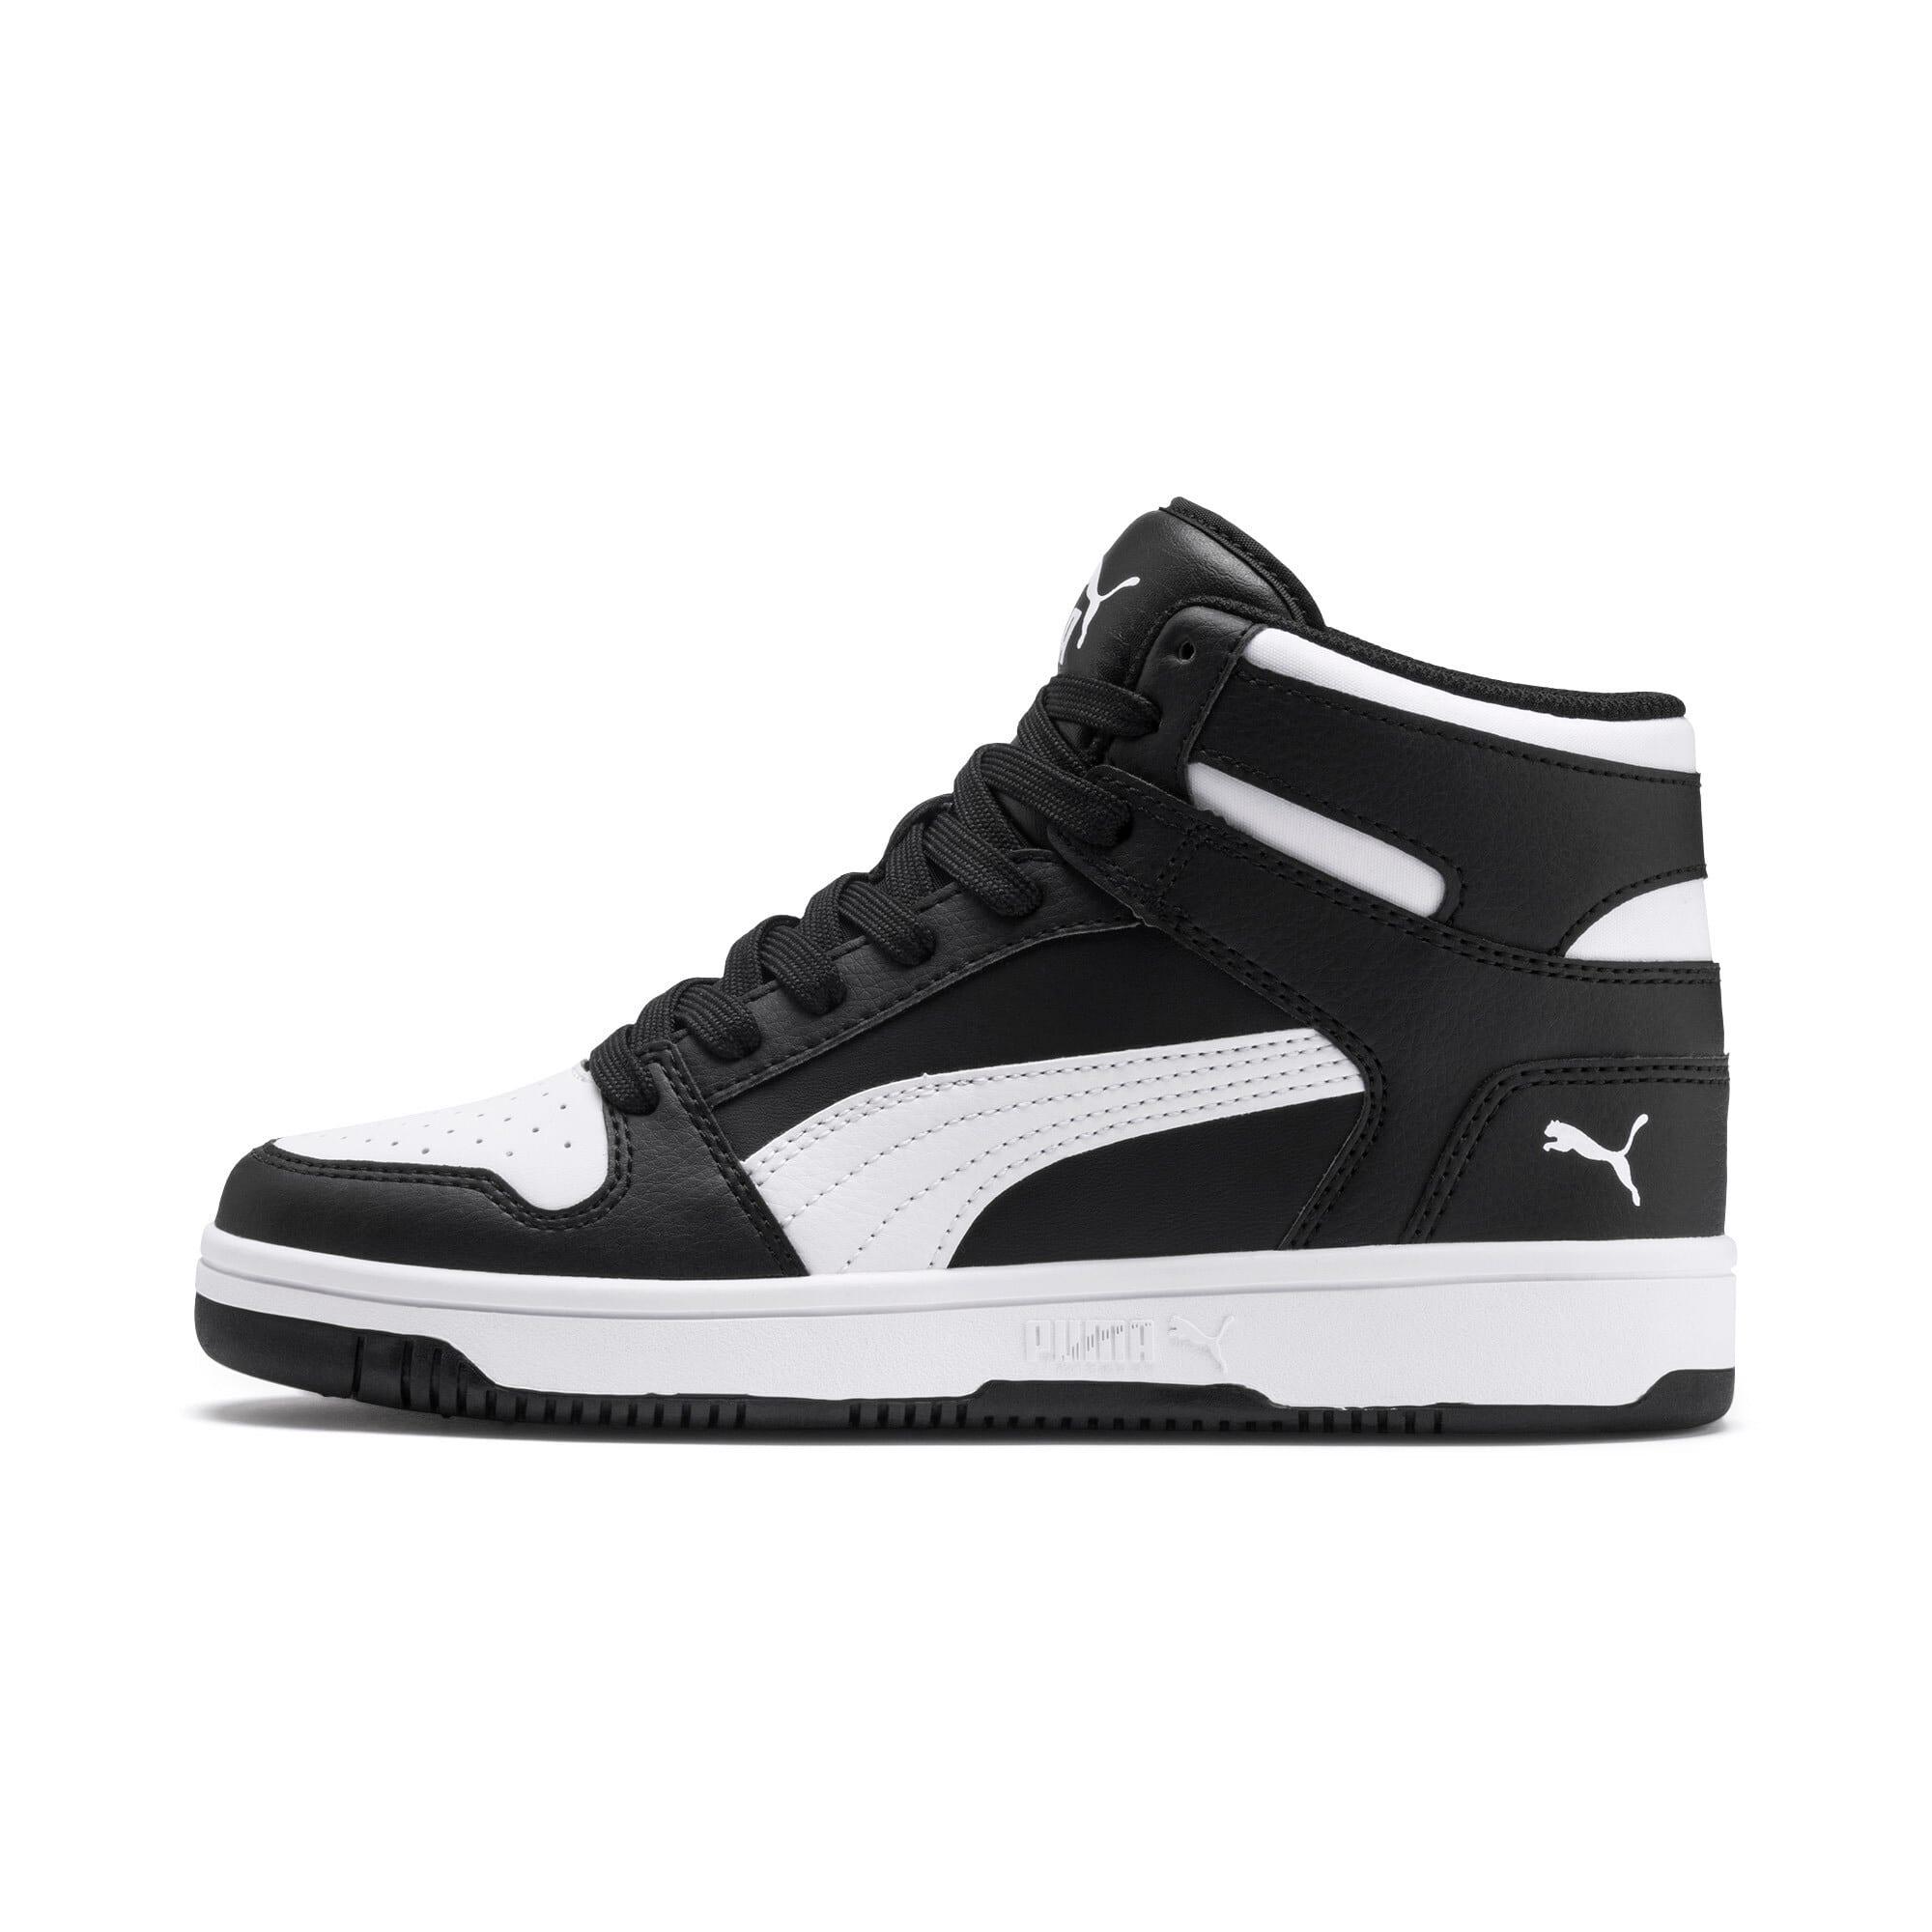 Thumbnail 1 of PUMA Rebound LayUp Mid Sneakers JR, Puma Black-Puma White, medium